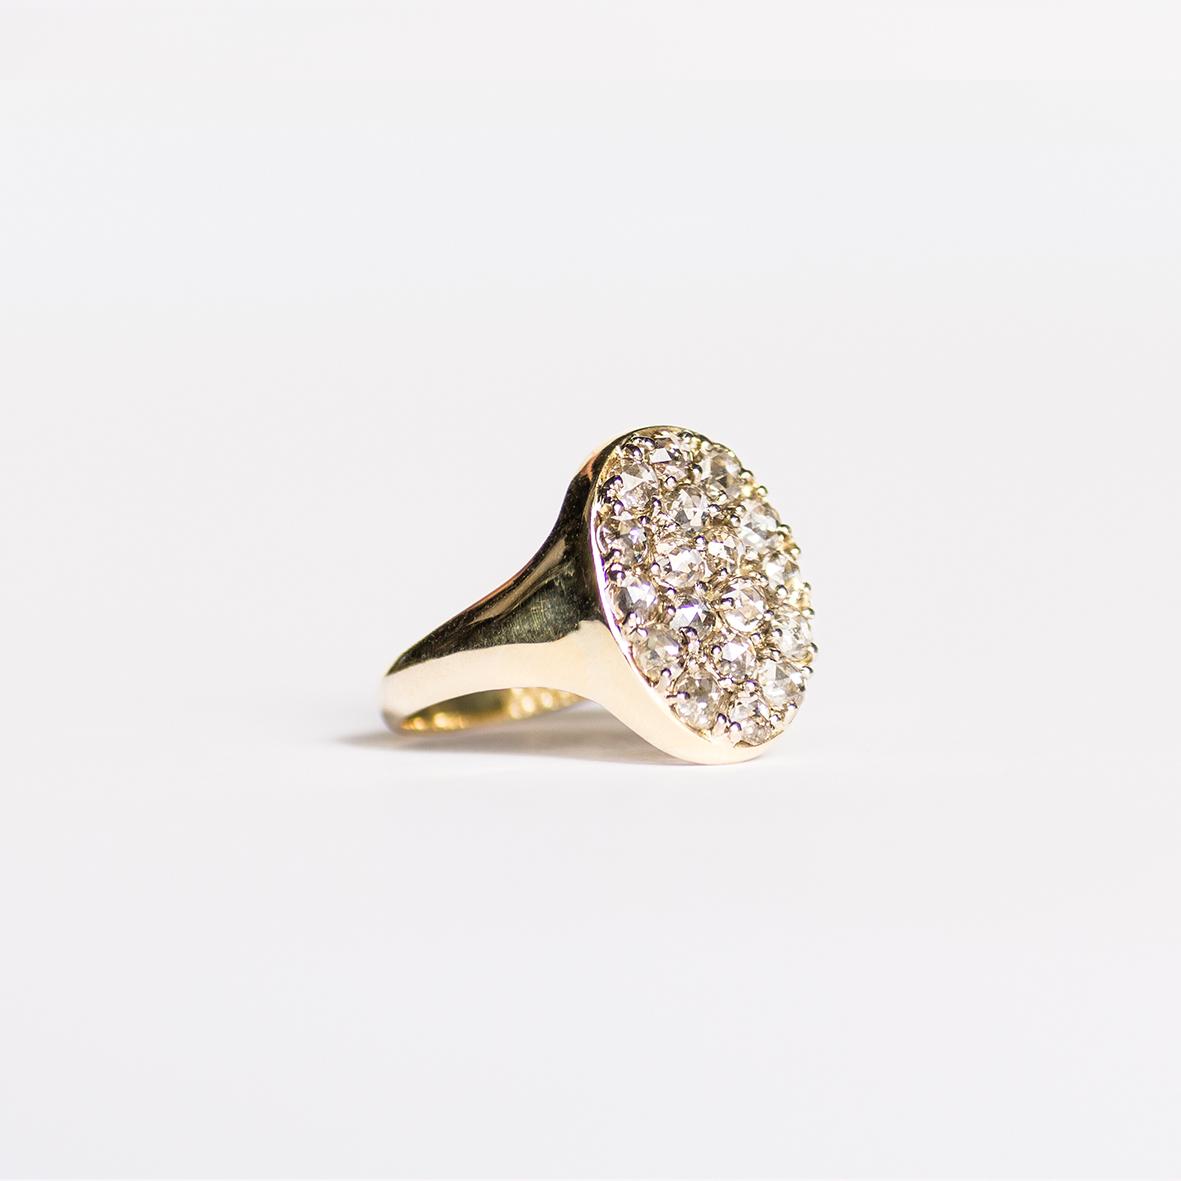 2. OONA_lotus_ficha2_signet diamond ring